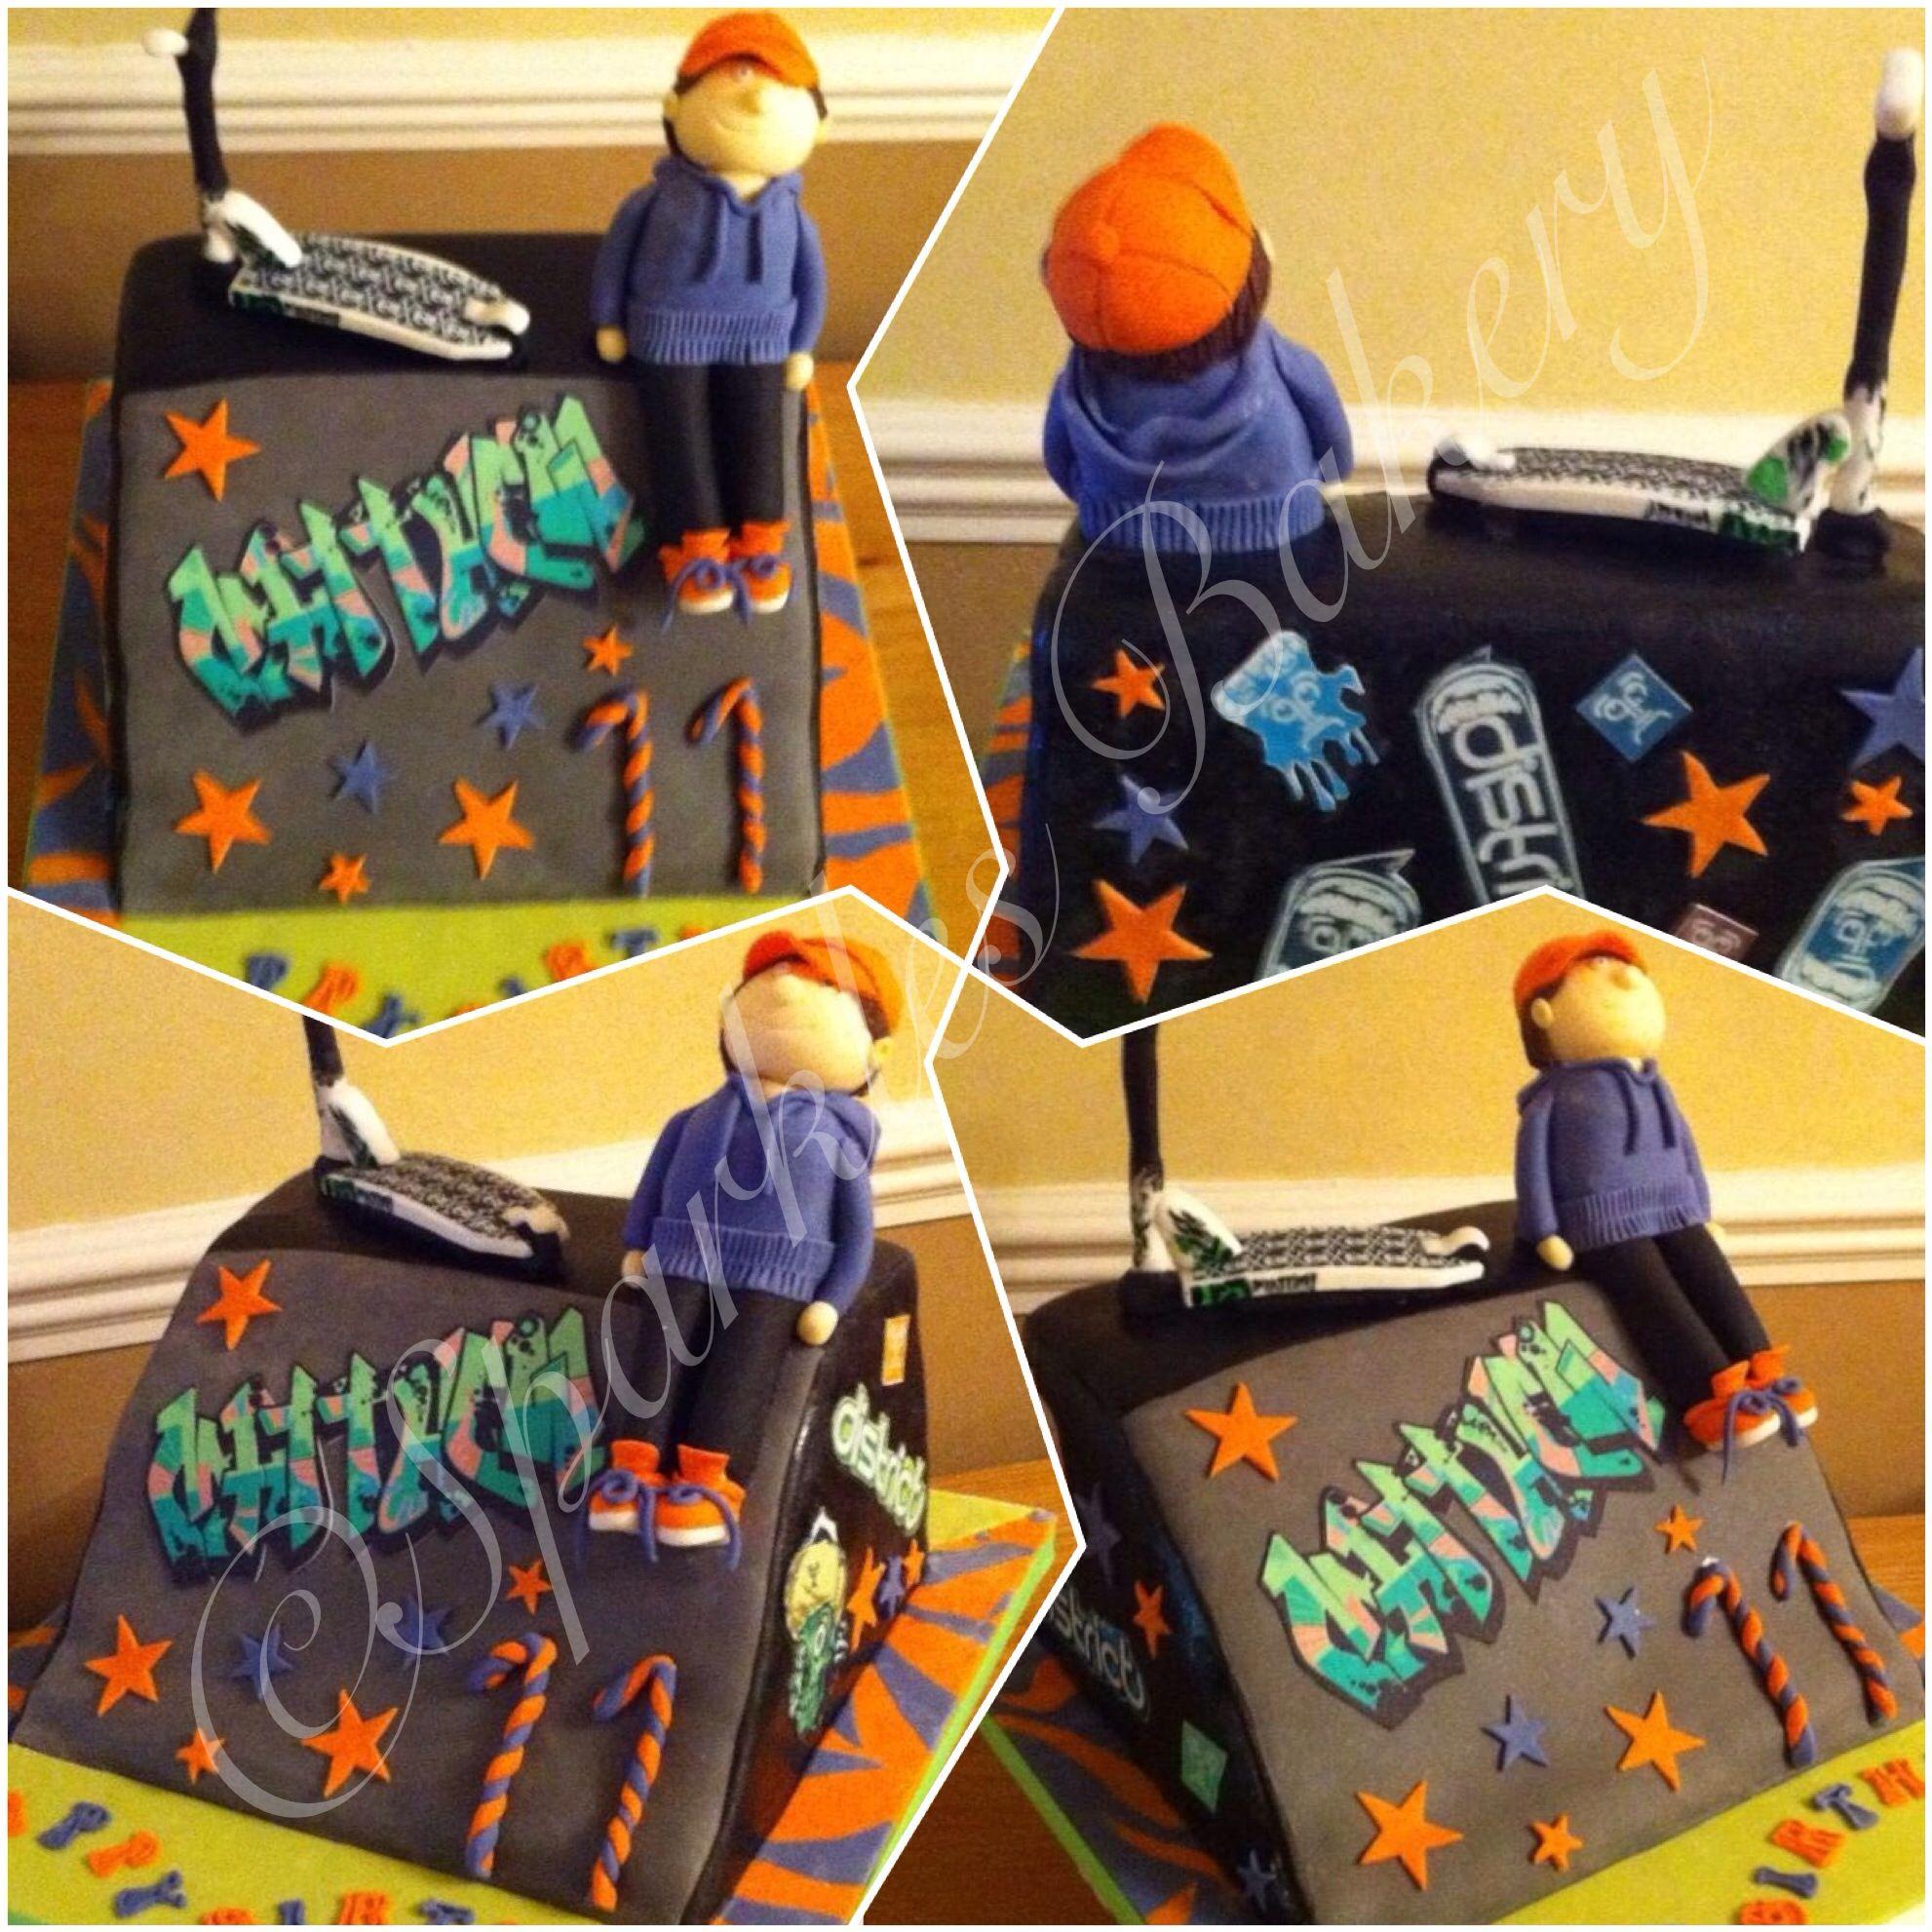 Skate ramp scooter cake   Cake decorating kits, Cake ...